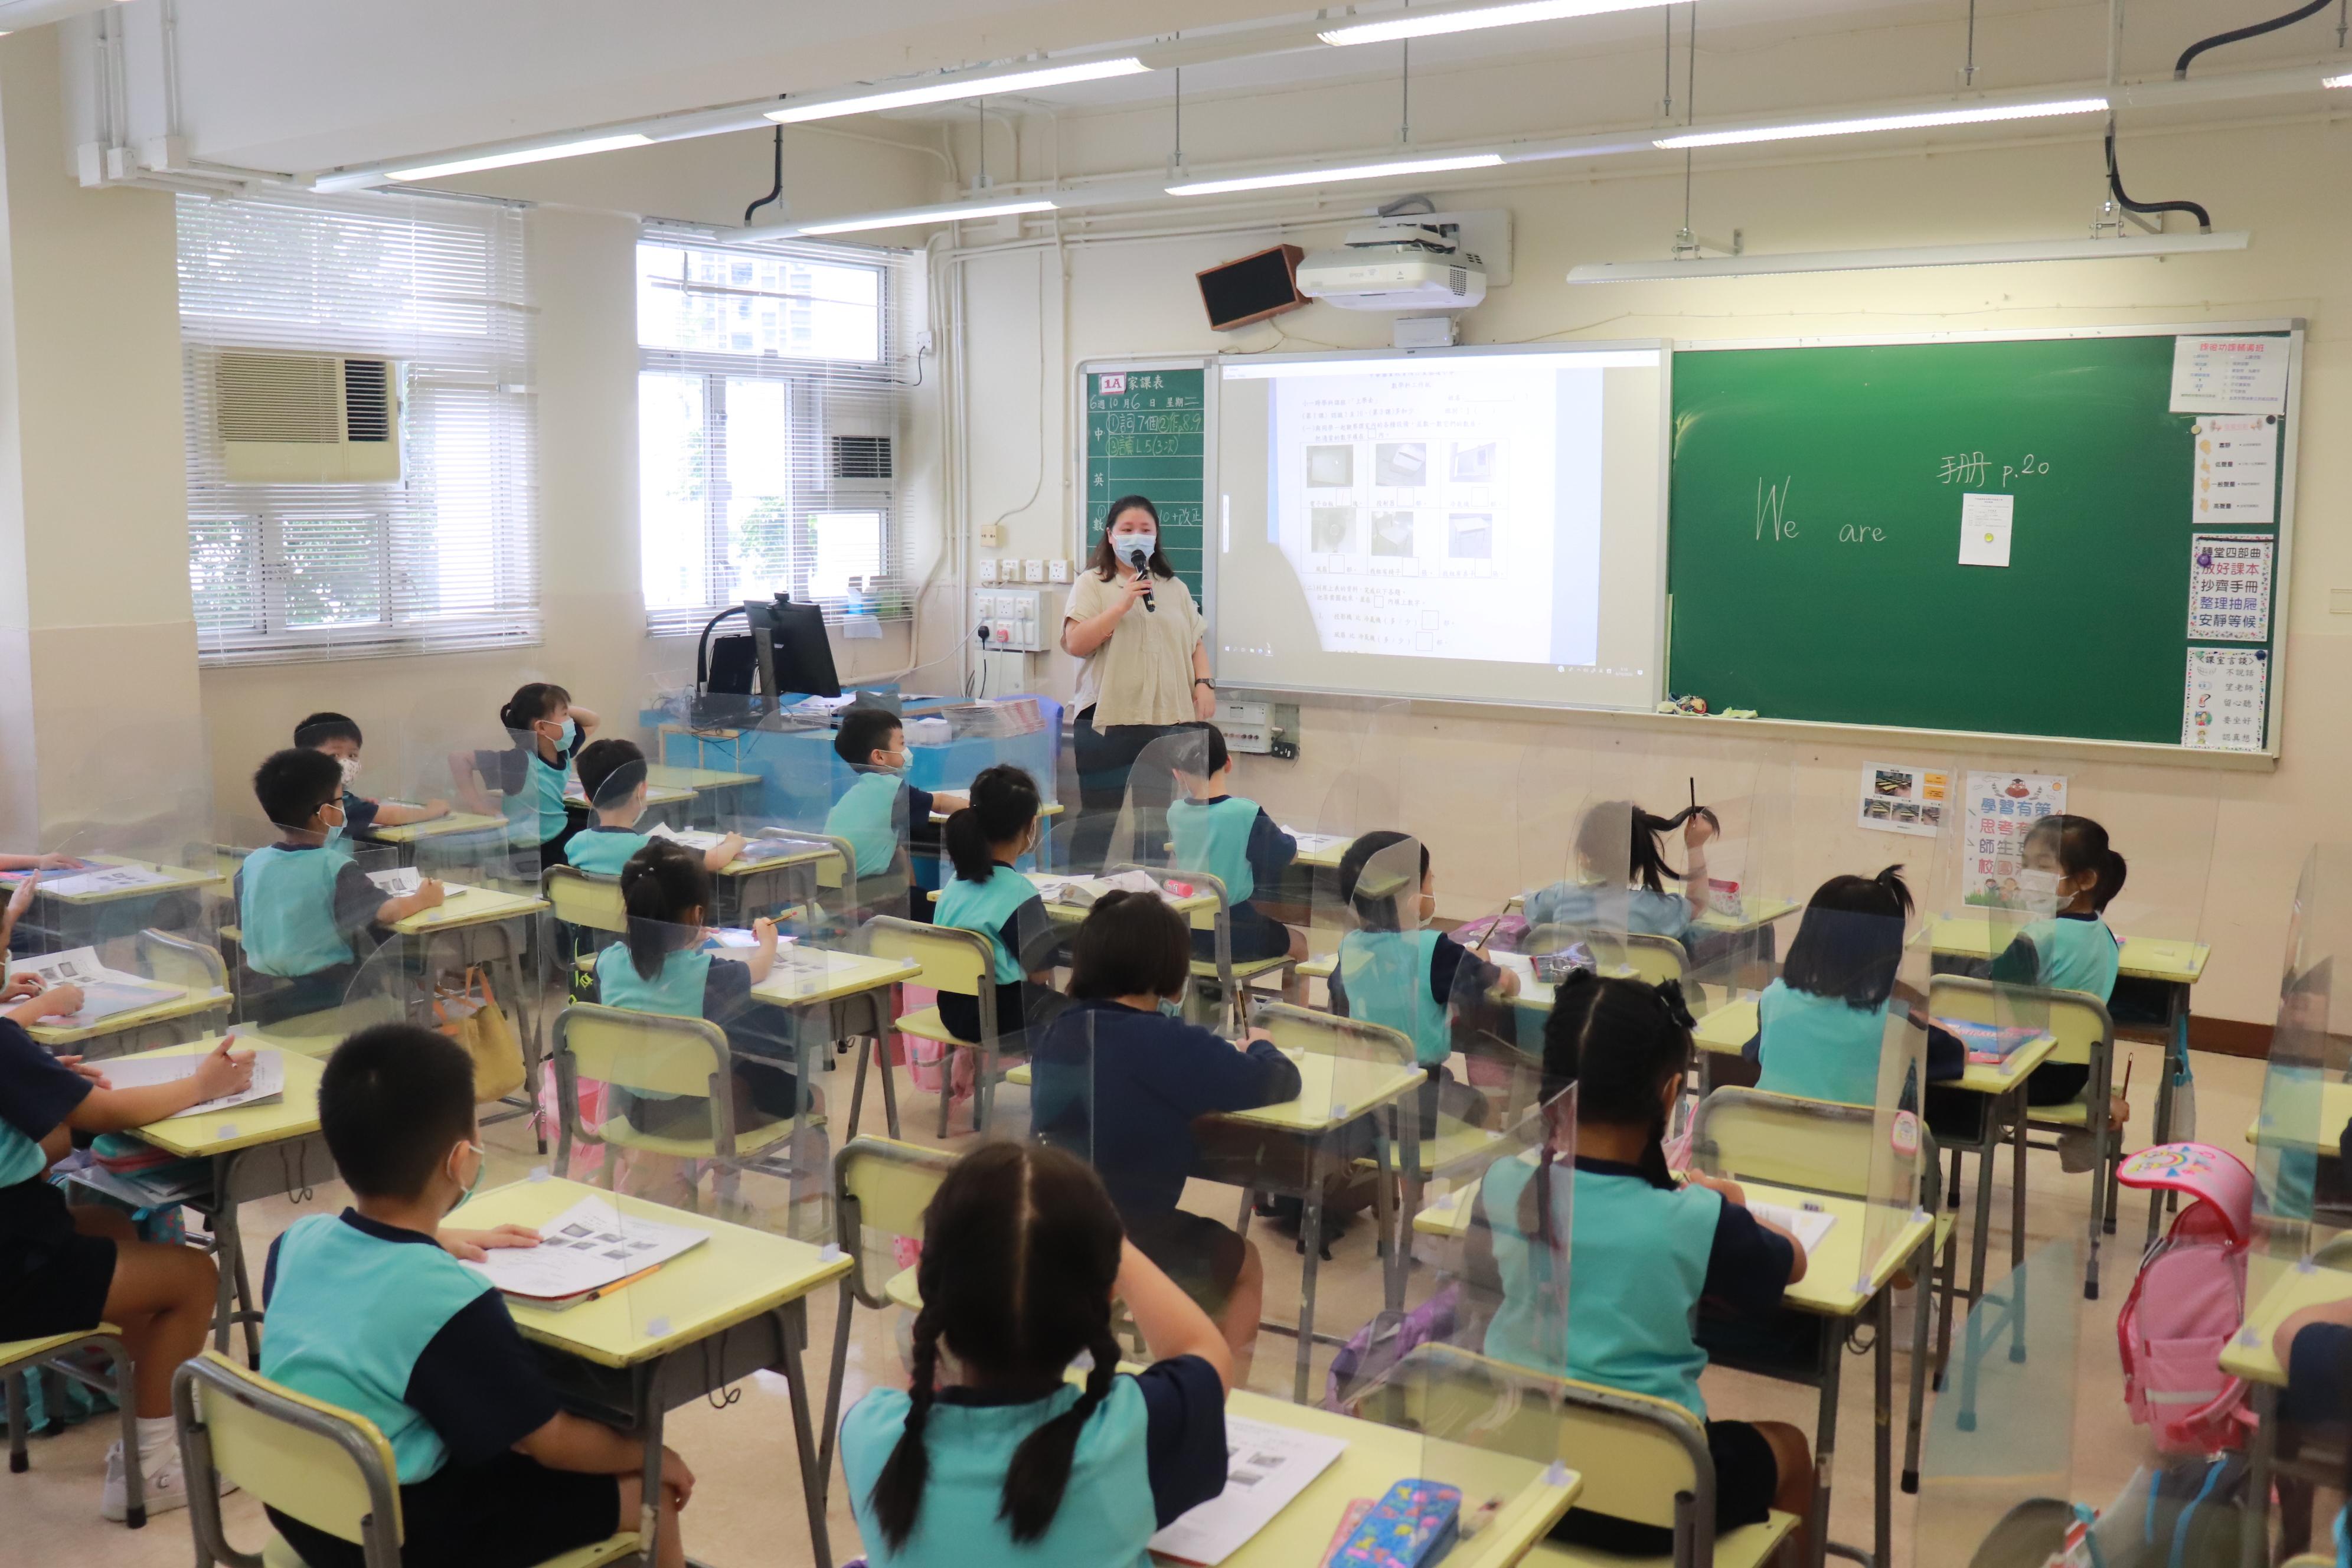 http://keito.school.hk/sites/default/files/img_6154.jpg